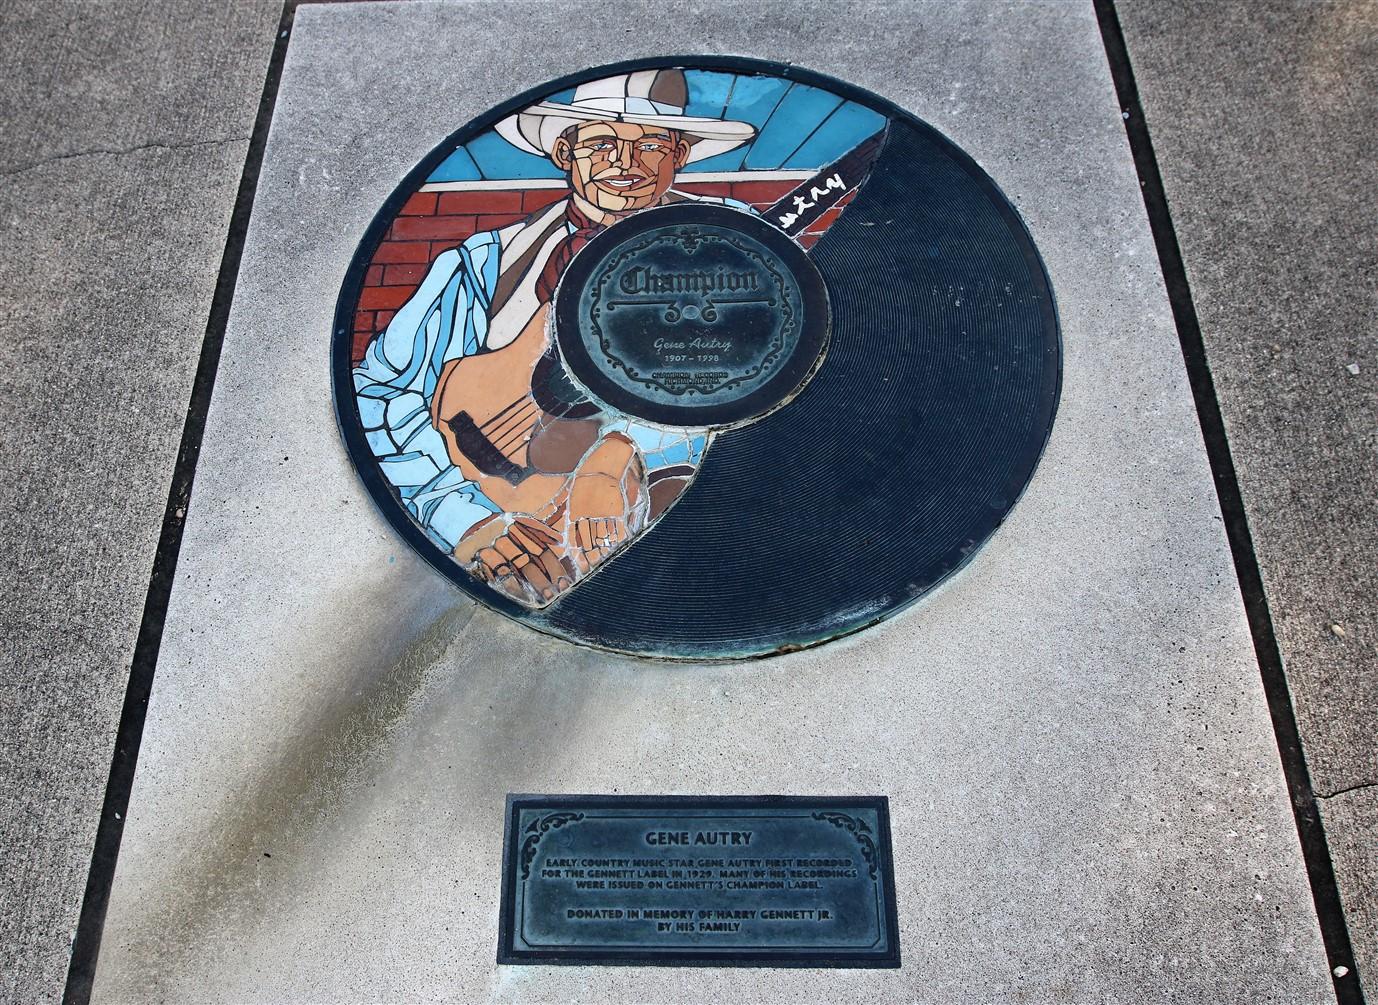 2018 07 17 435  Richmond IN Gennett Records Walk of Fame.jpg